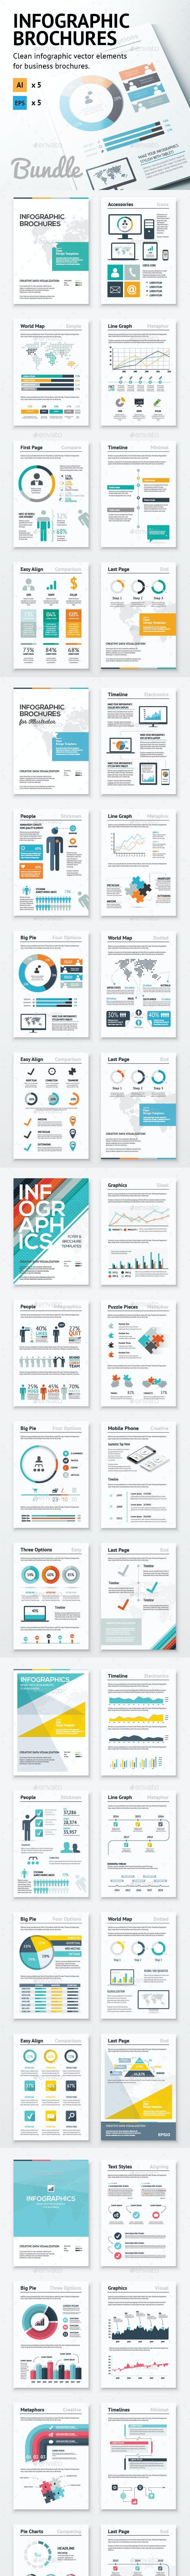 Infographic Brochure Elements Bundle - Infographics